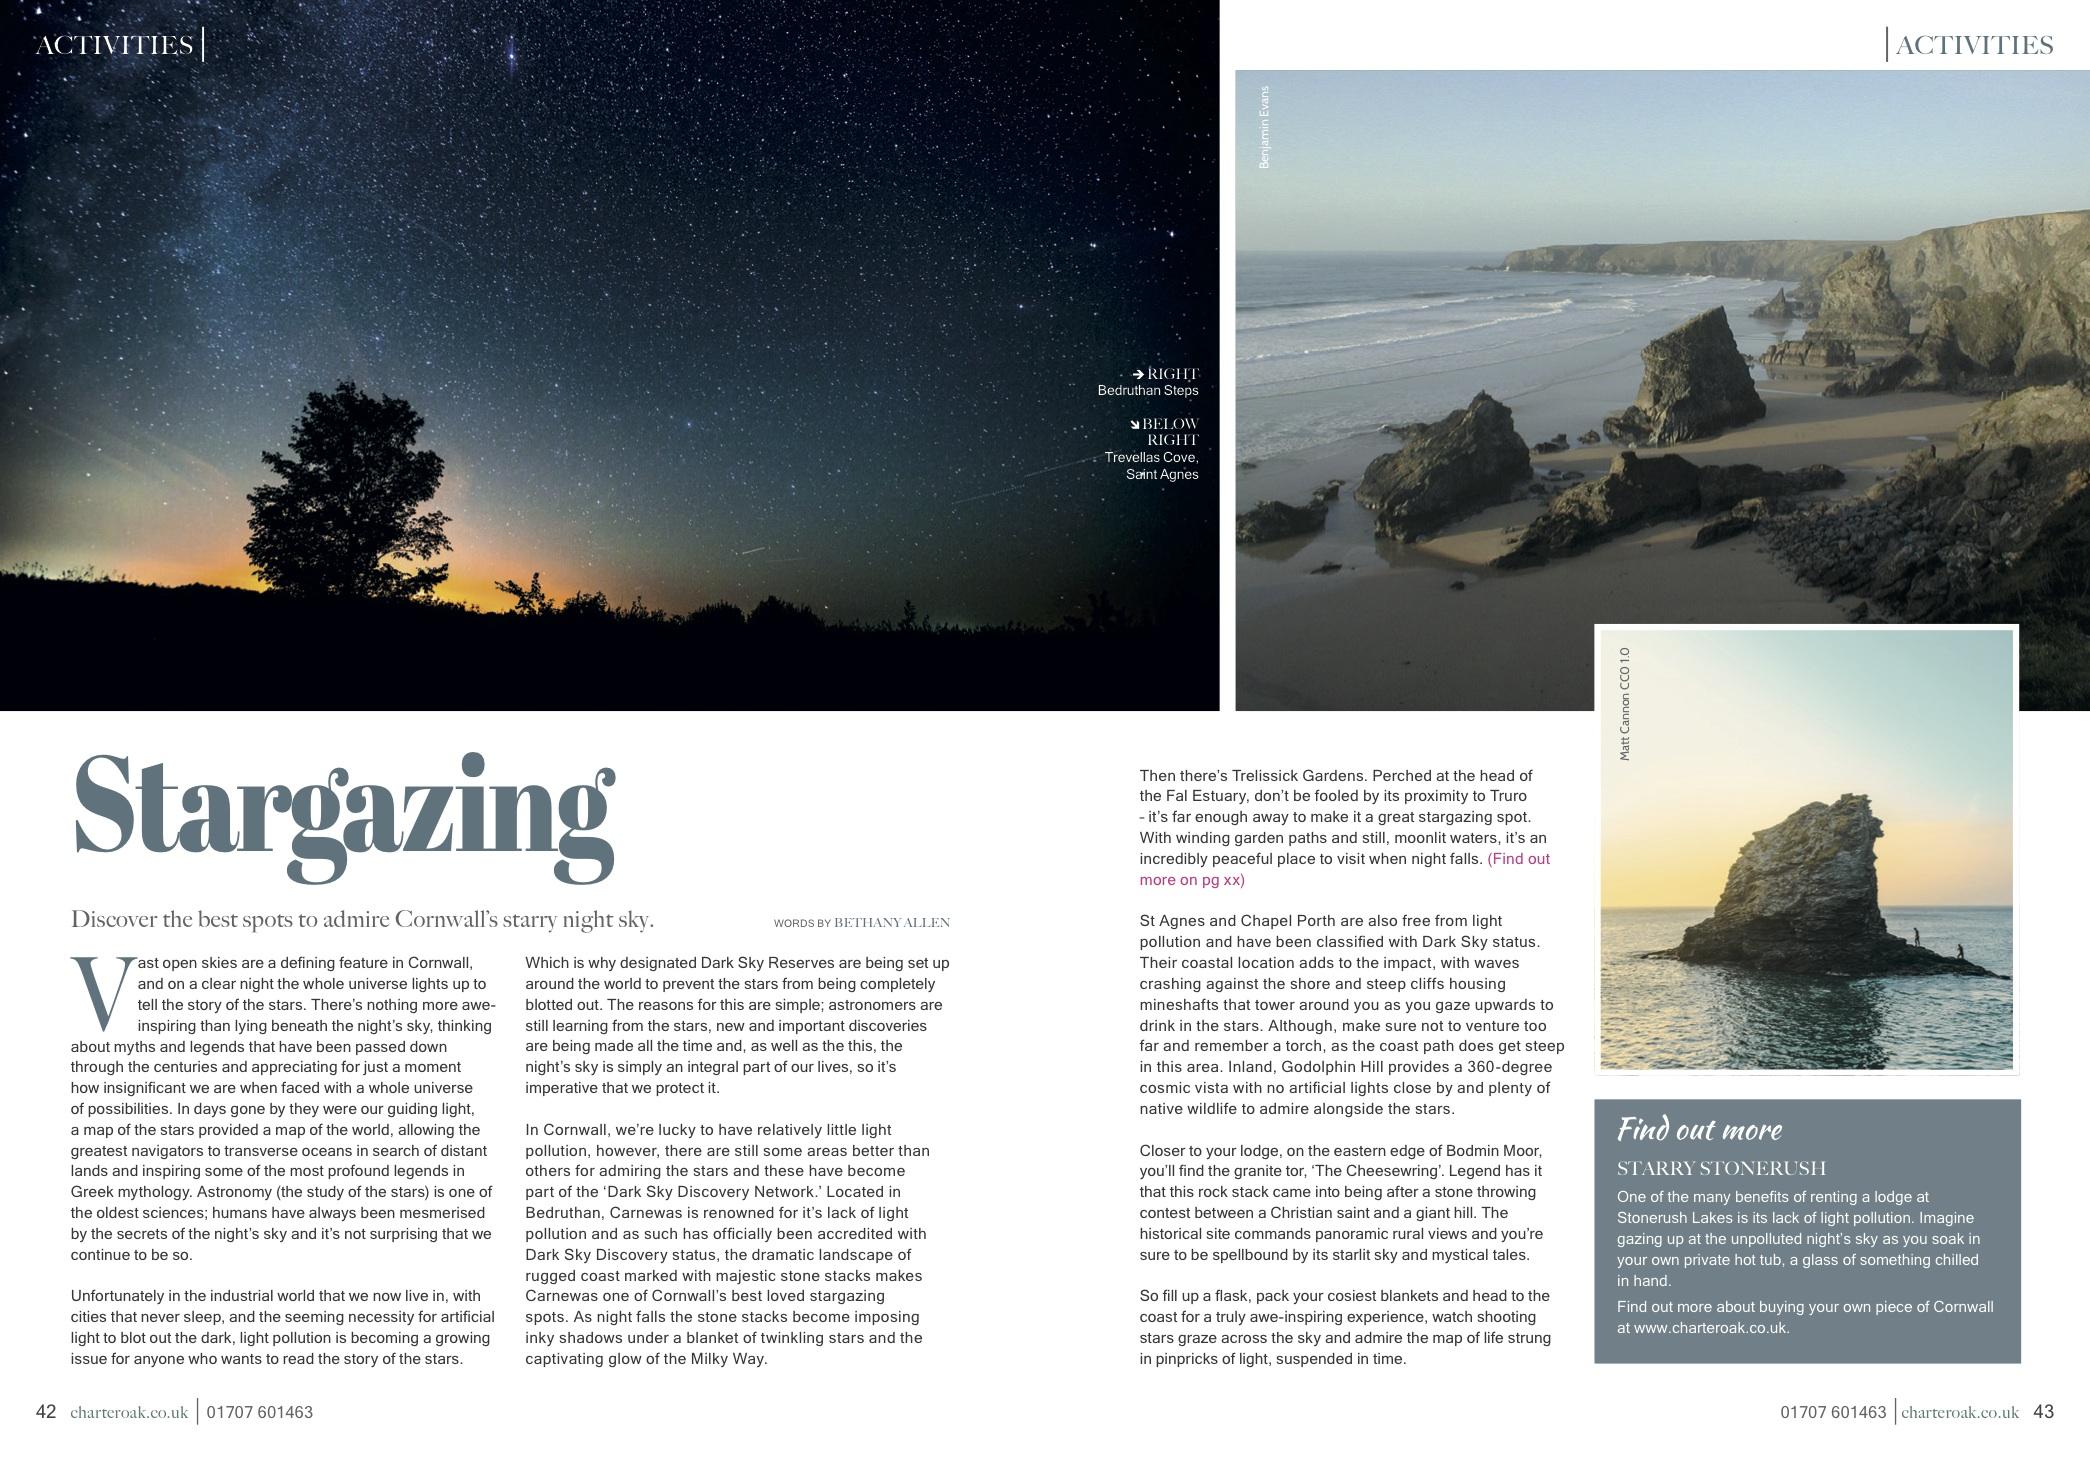 Stargazing - For Charteroak magazine